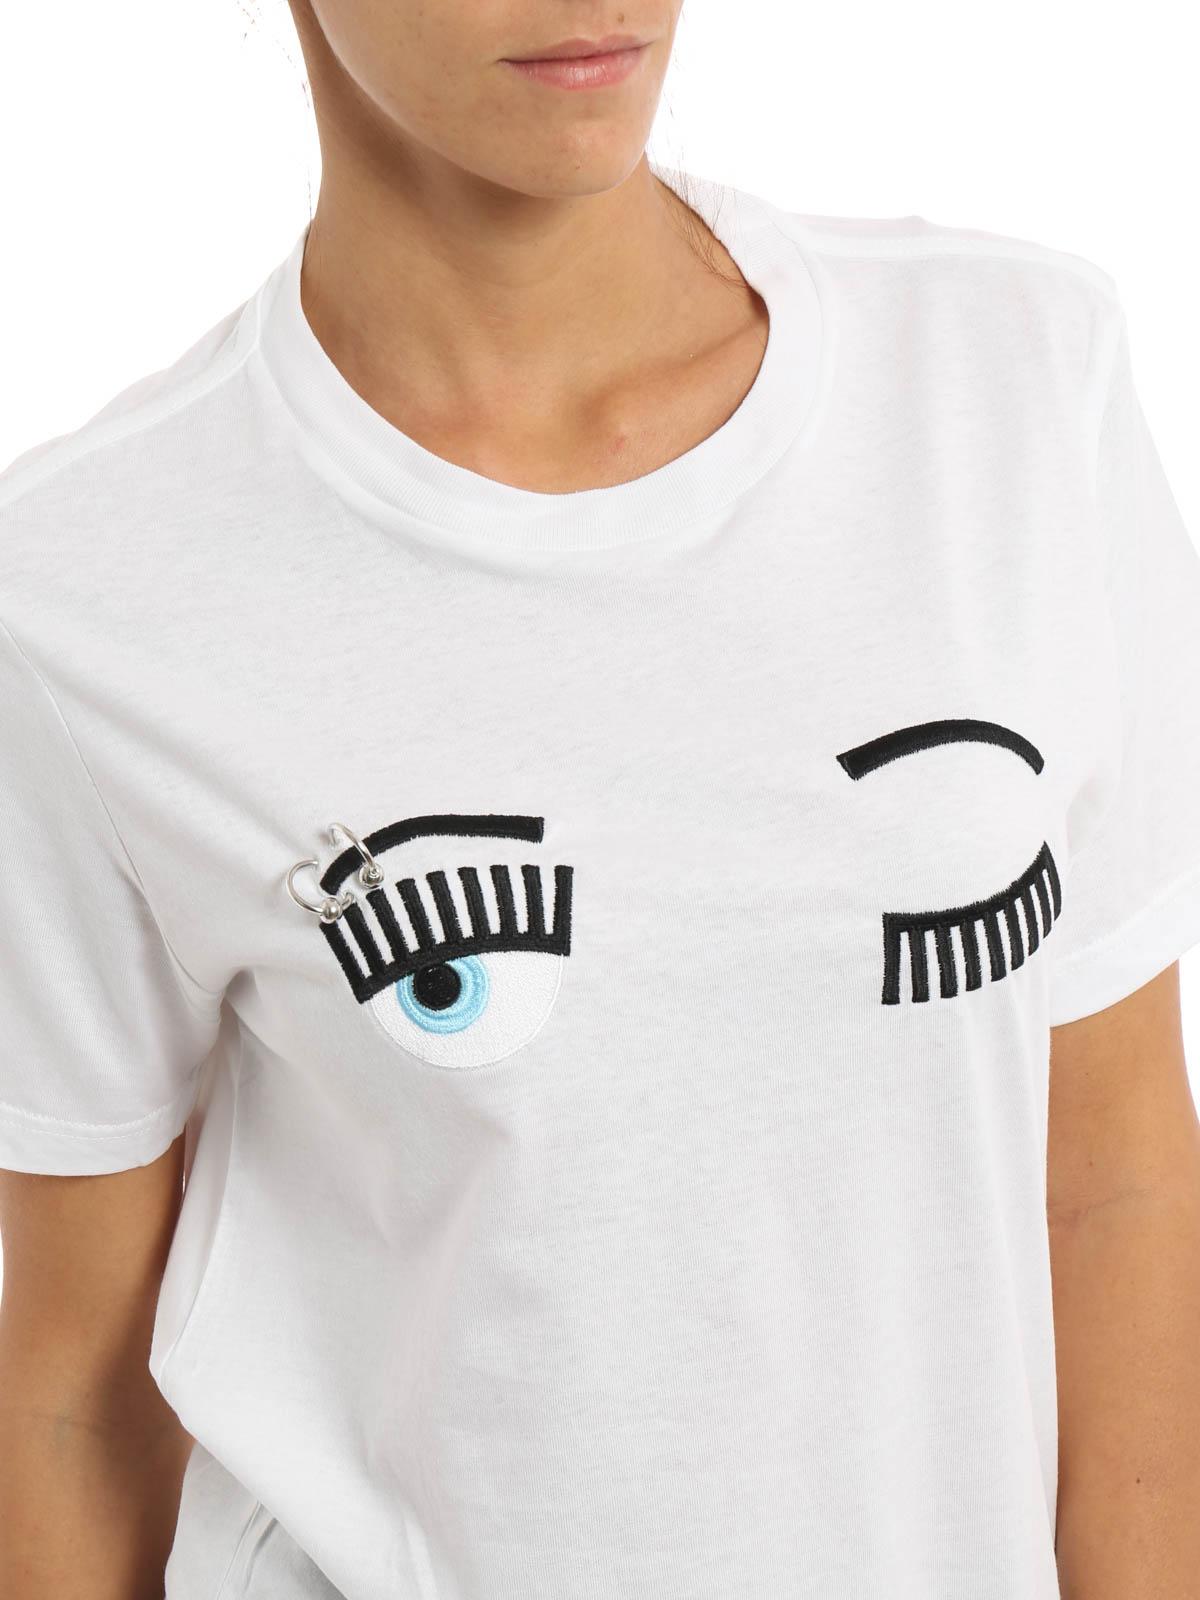 Chiara Ferragni Flirting T-shirt aySkktStGF